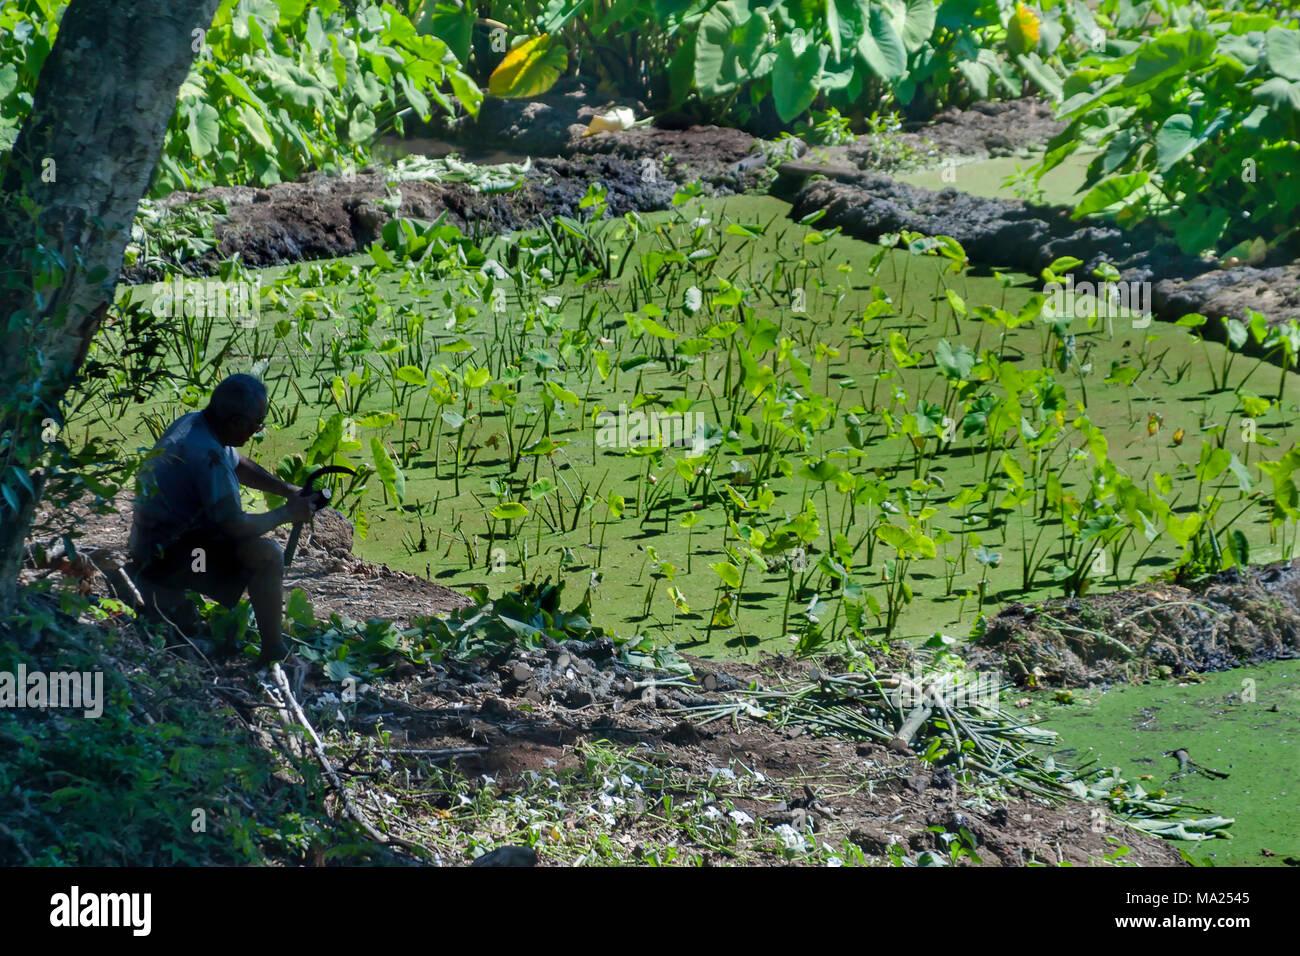 Taro Patch Stock Photos Images Alamy Navy A Older Hawaiian Gentleman Working On His The Island Of Molokai Hawaii